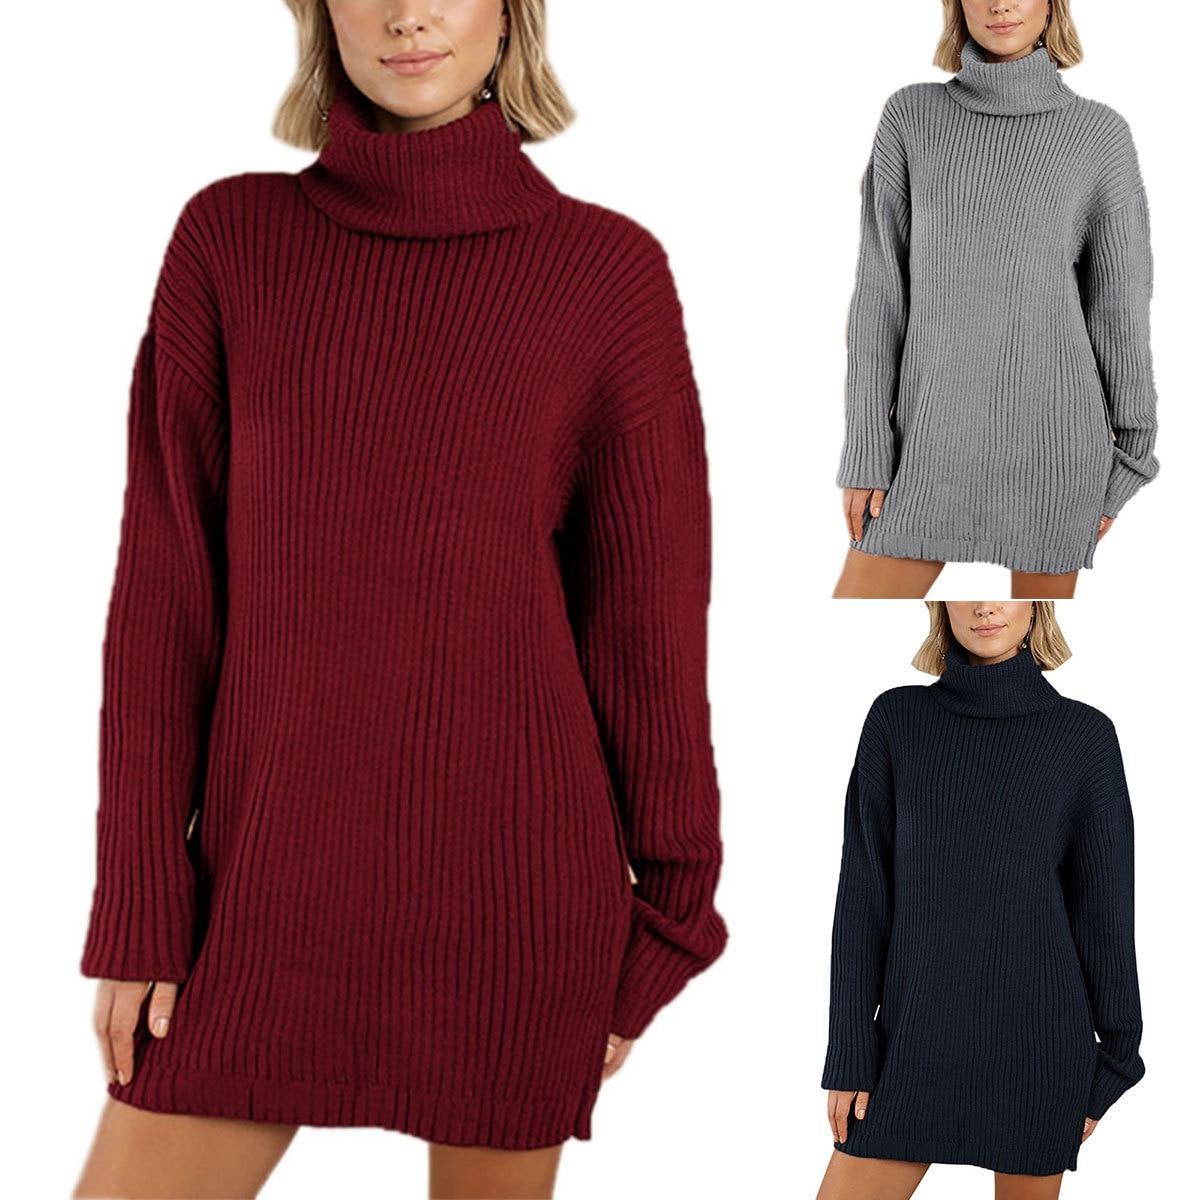 Women High Neckline Knitted Dresses Turtleneck Plus Size XXL 2XL Dress 82